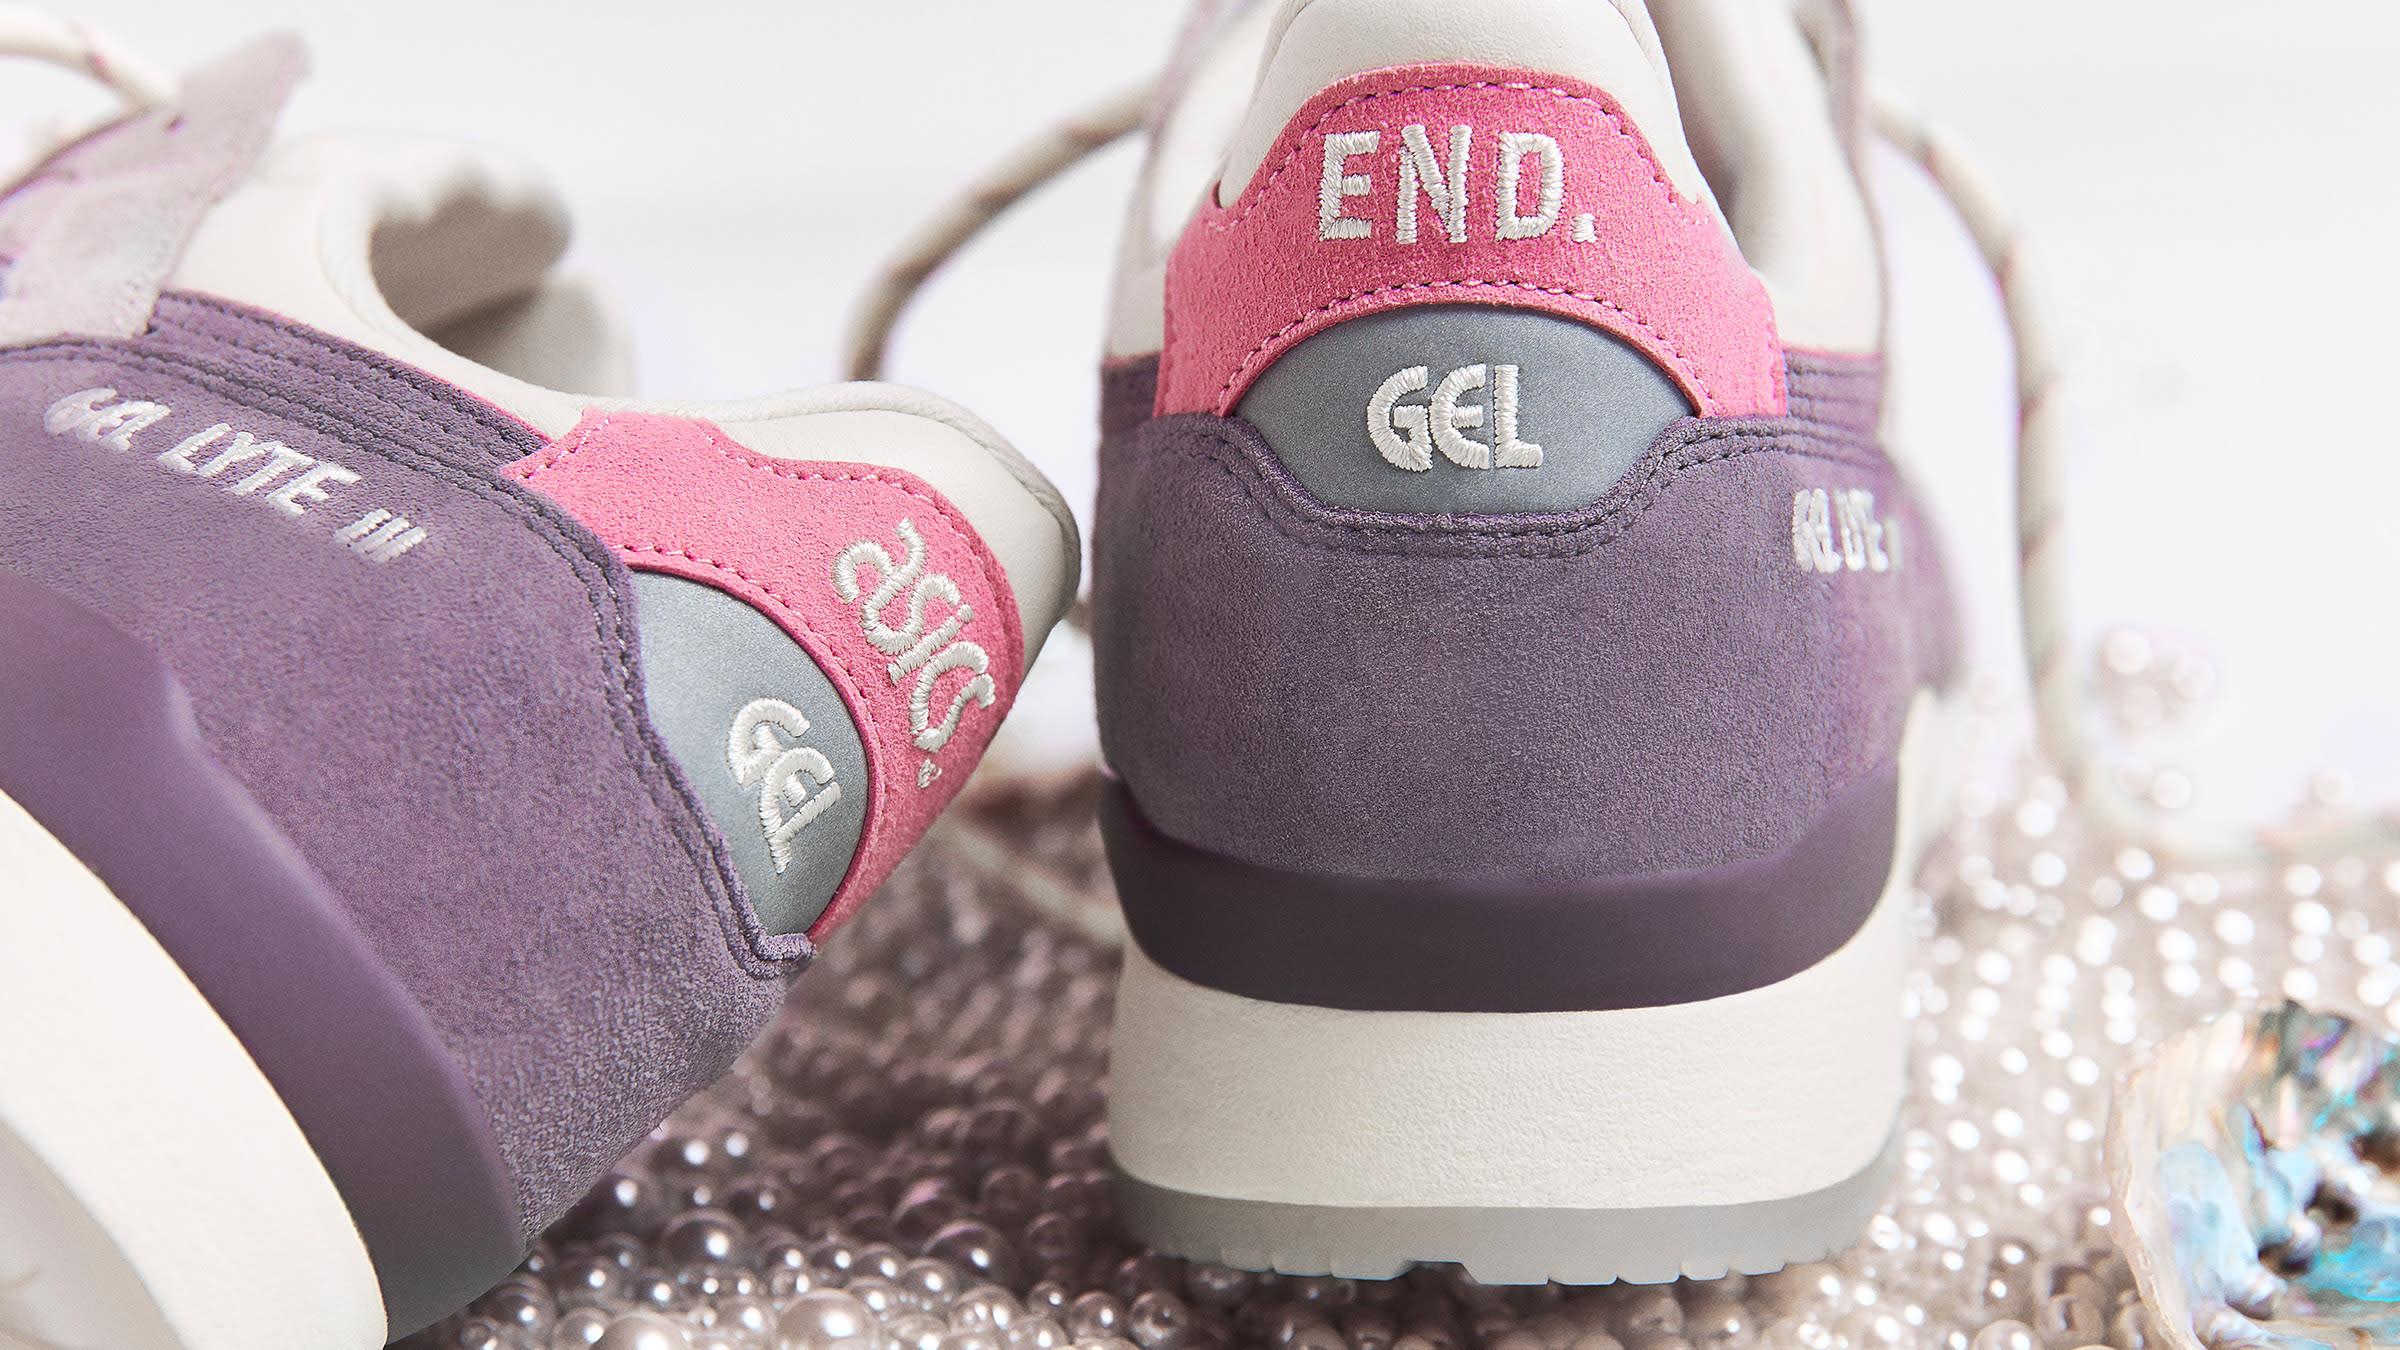 END x ASICS GEL-LYTE III